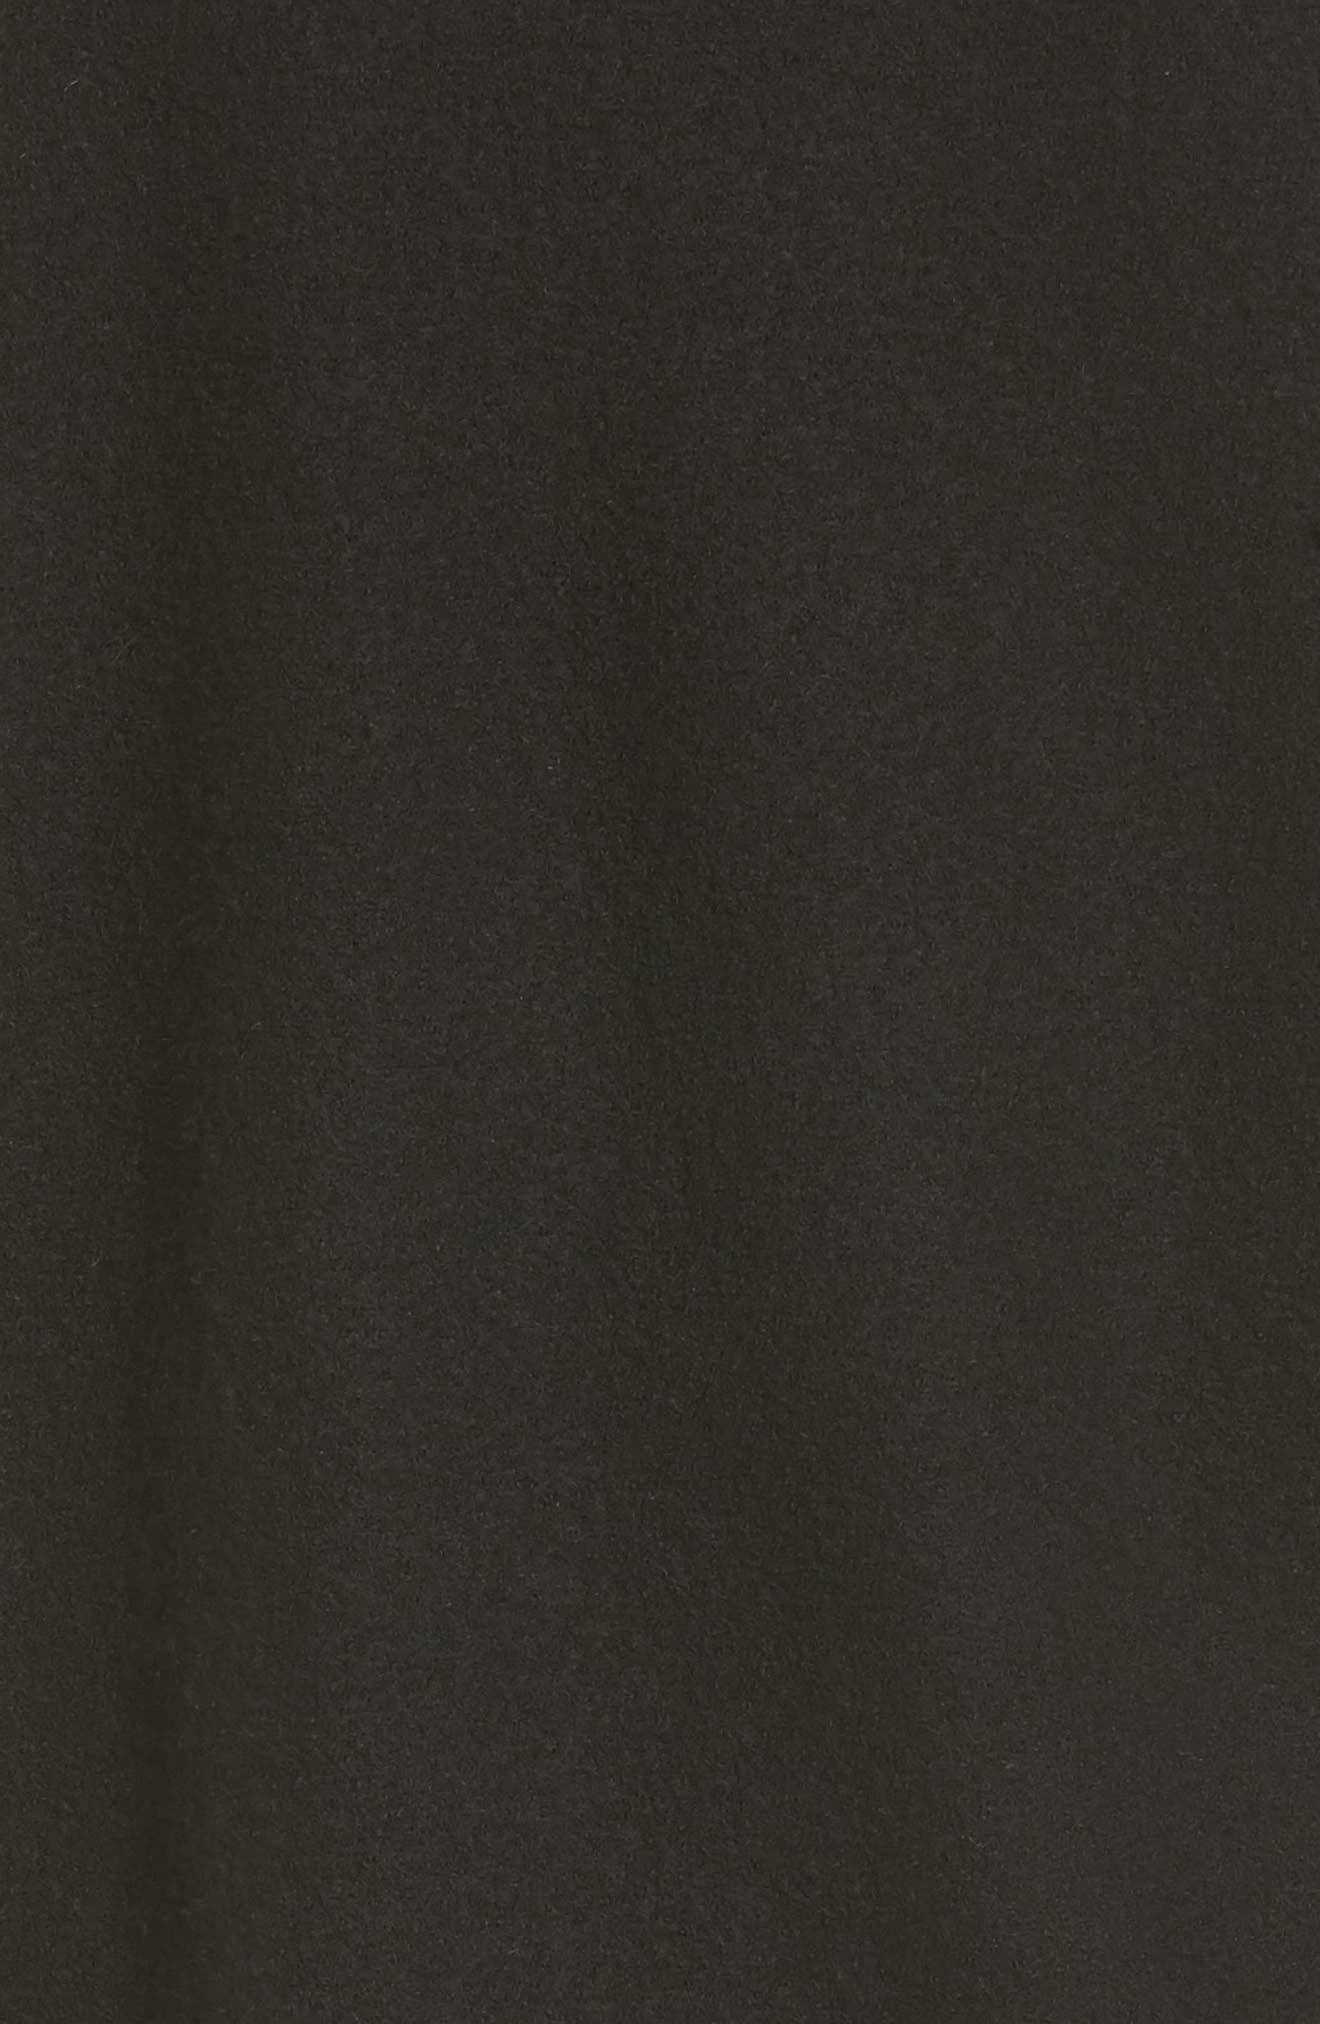 Cashmere Crewneck Sweater,                             Alternate thumbnail 5, color,                             001